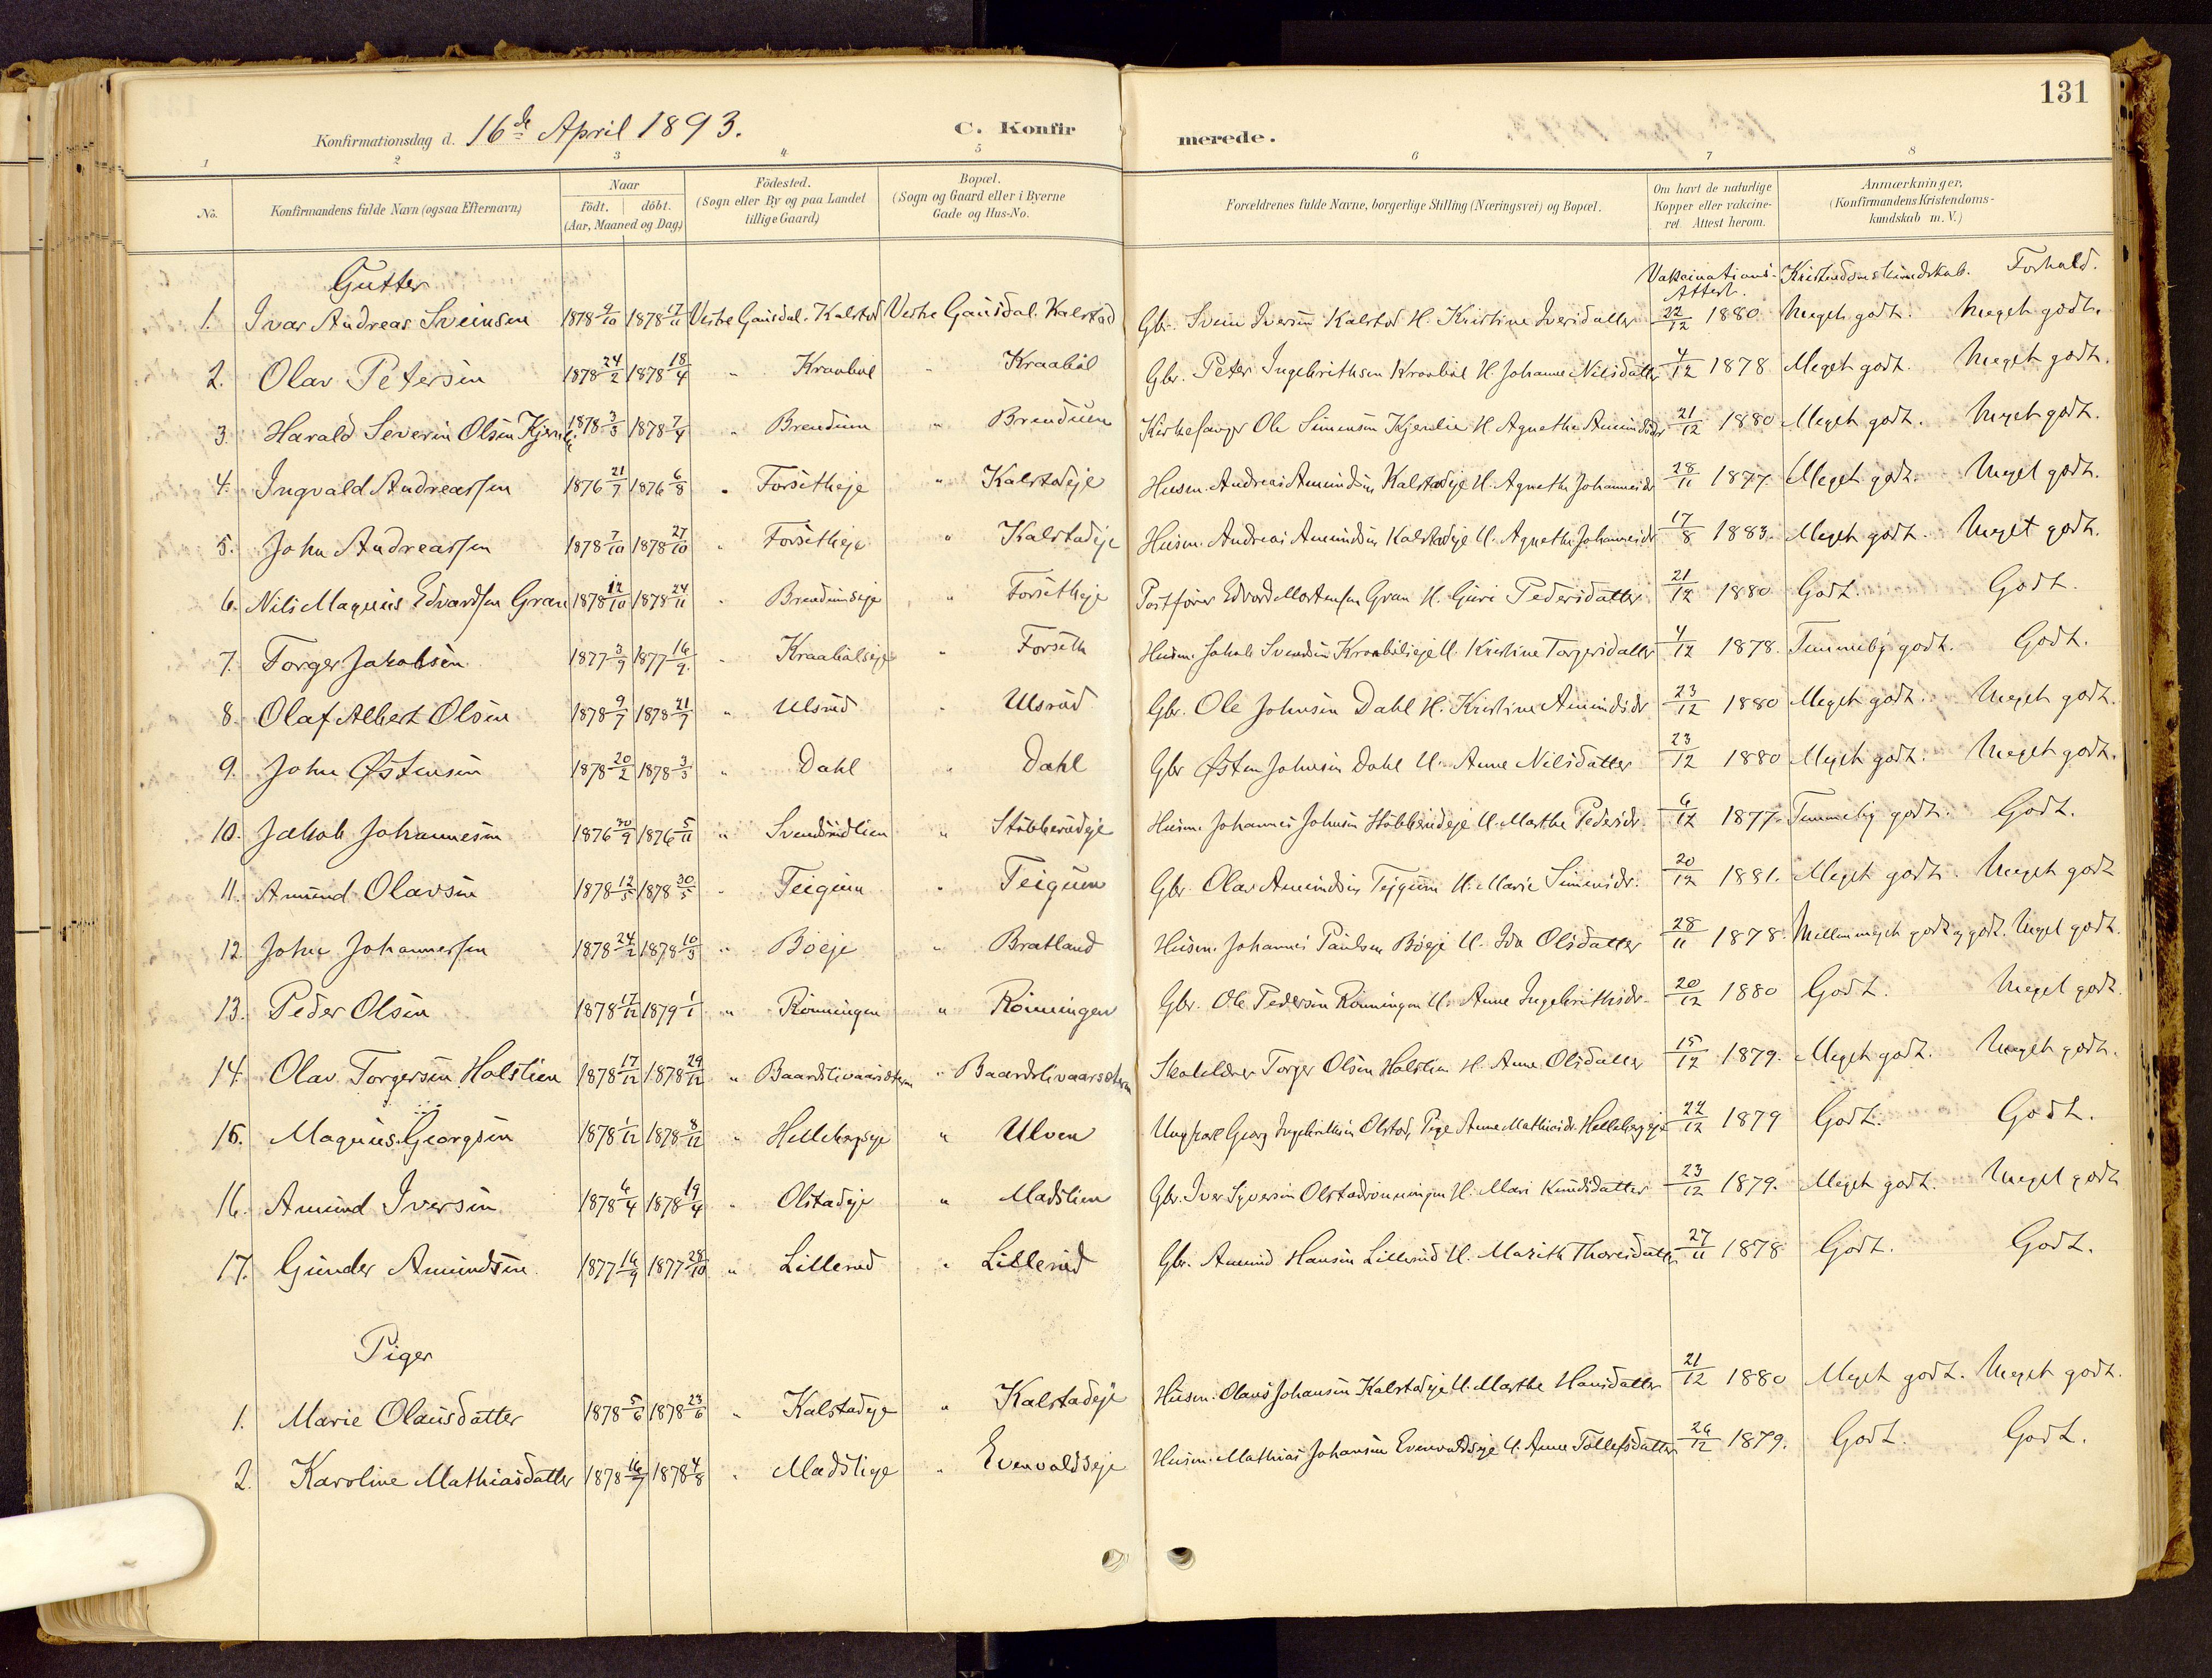 SAH, Vestre Gausdal prestekontor, Ministerialbok nr. 1, 1887-1914, s. 131